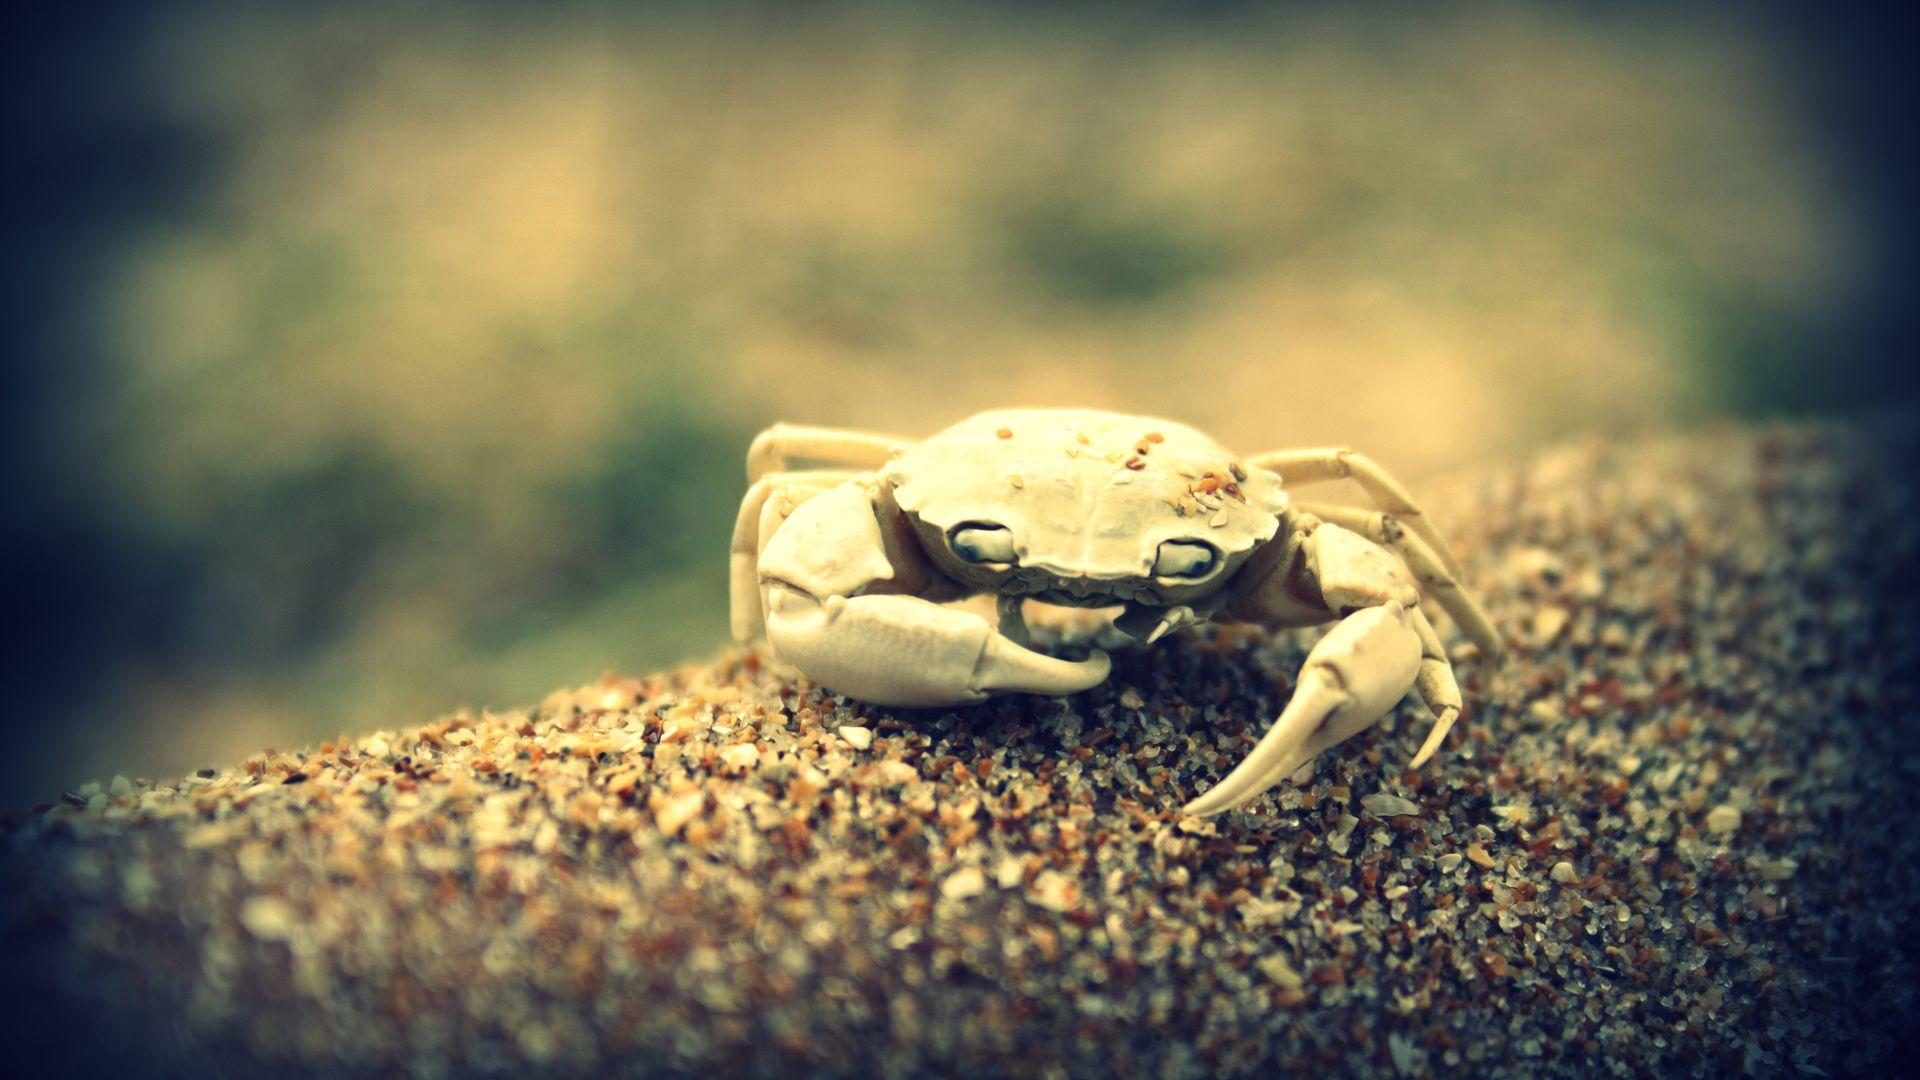 Crab Free Download Wallpaper